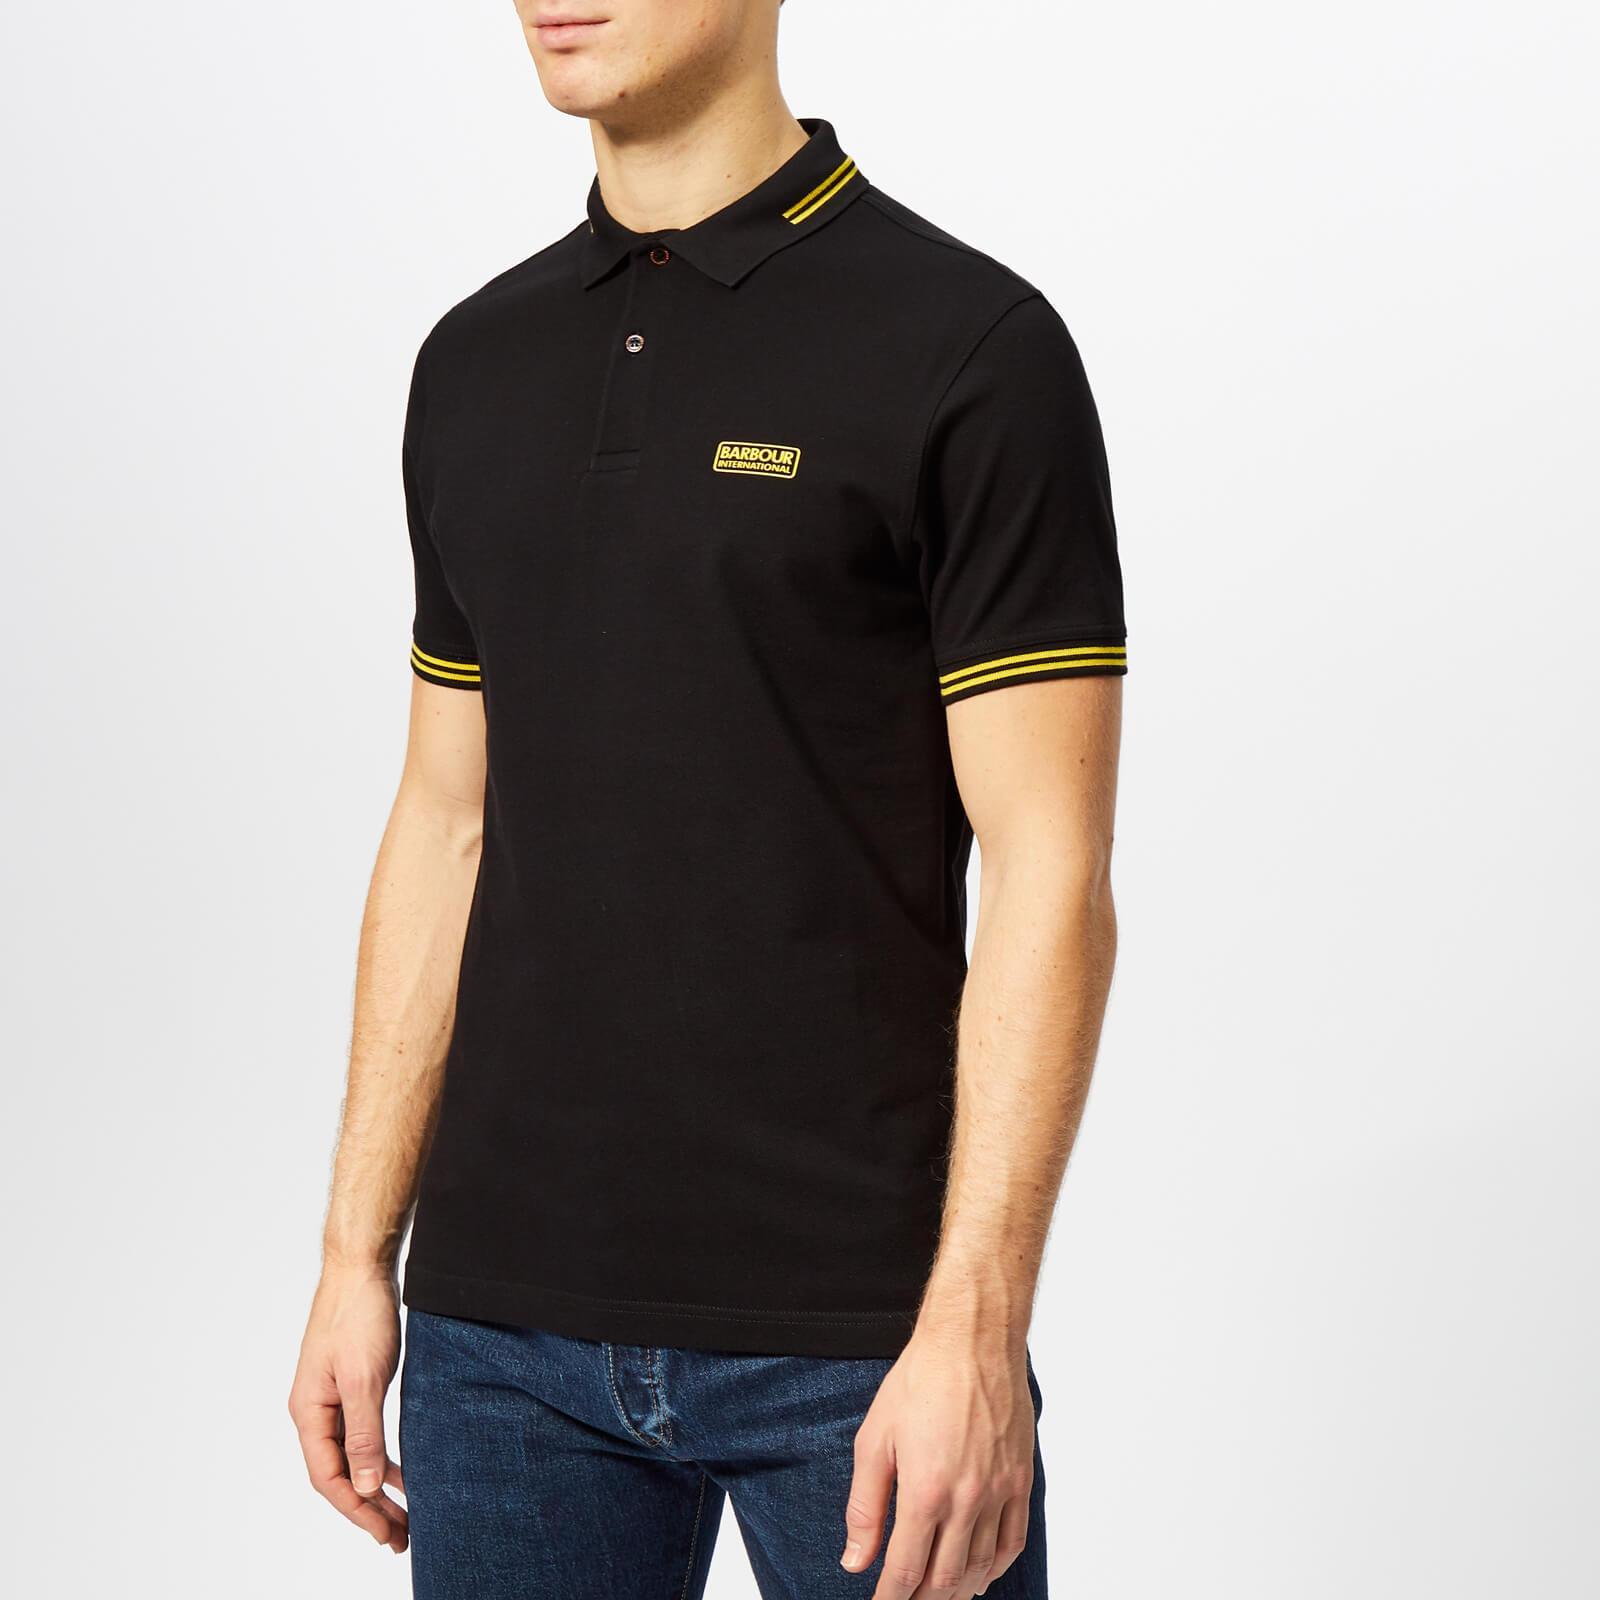 Barbour International Men's Essential Tipped Polo Shirt - Black - S